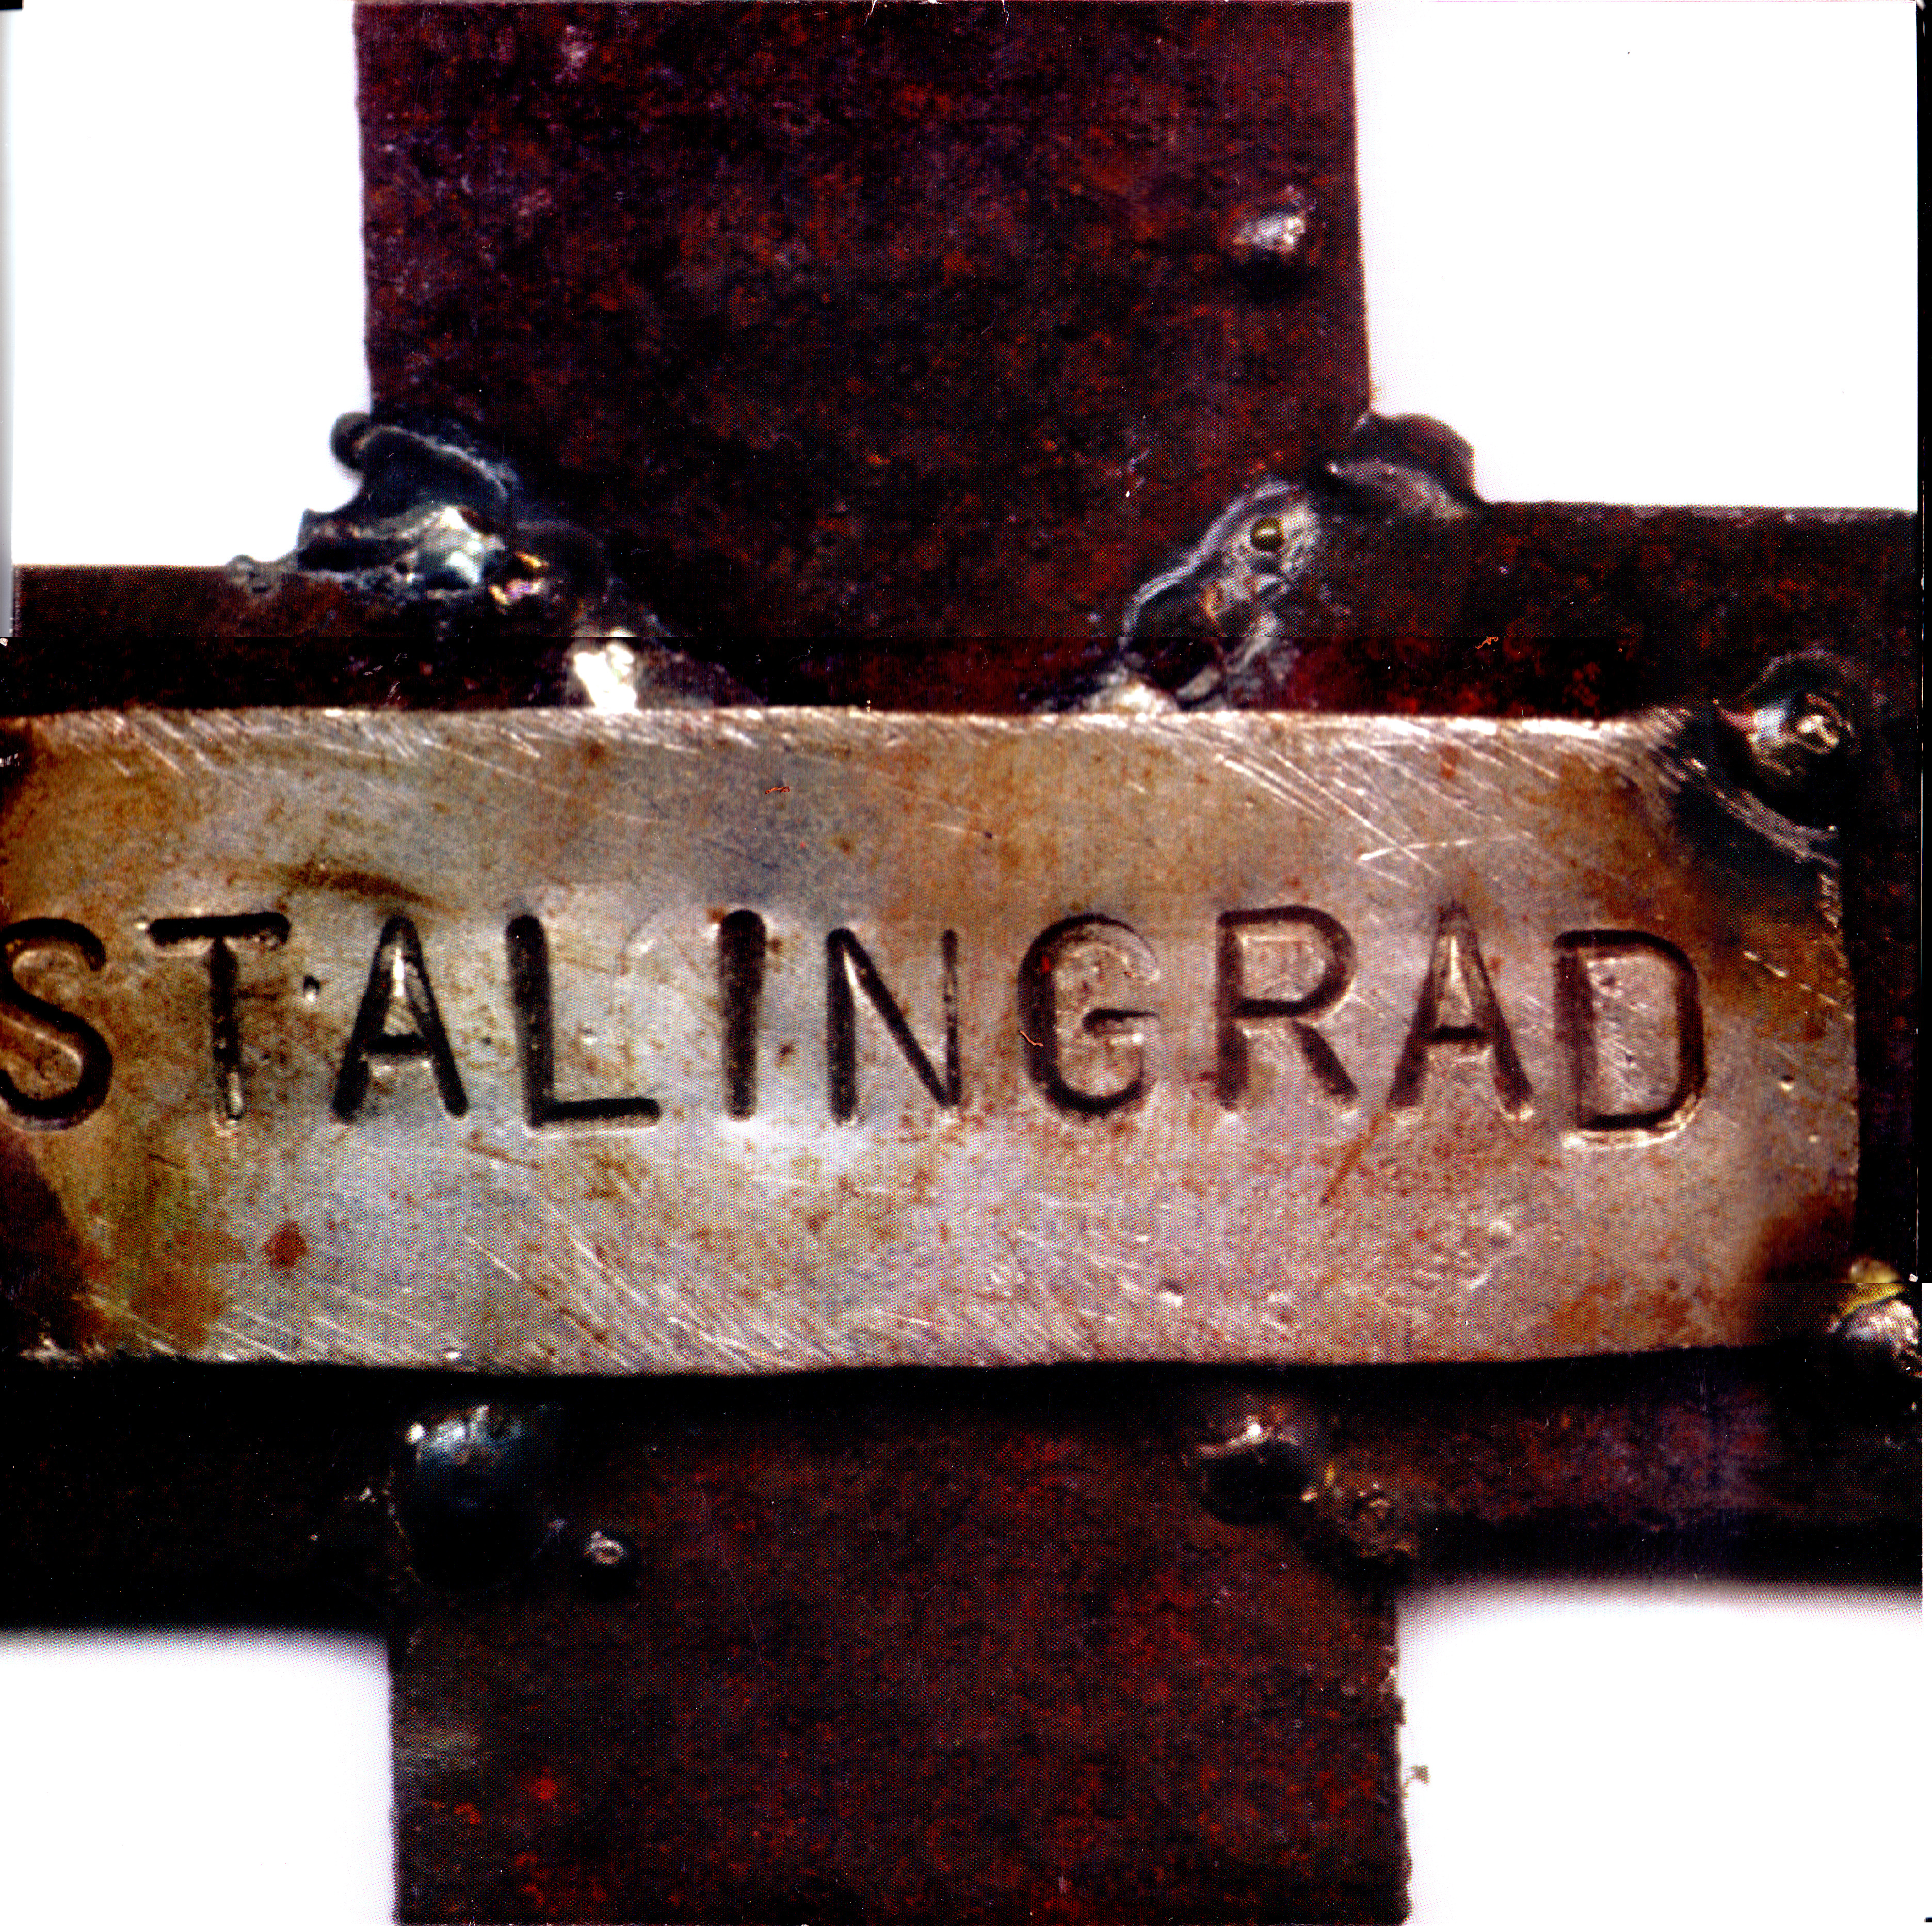 Stalingrad LP